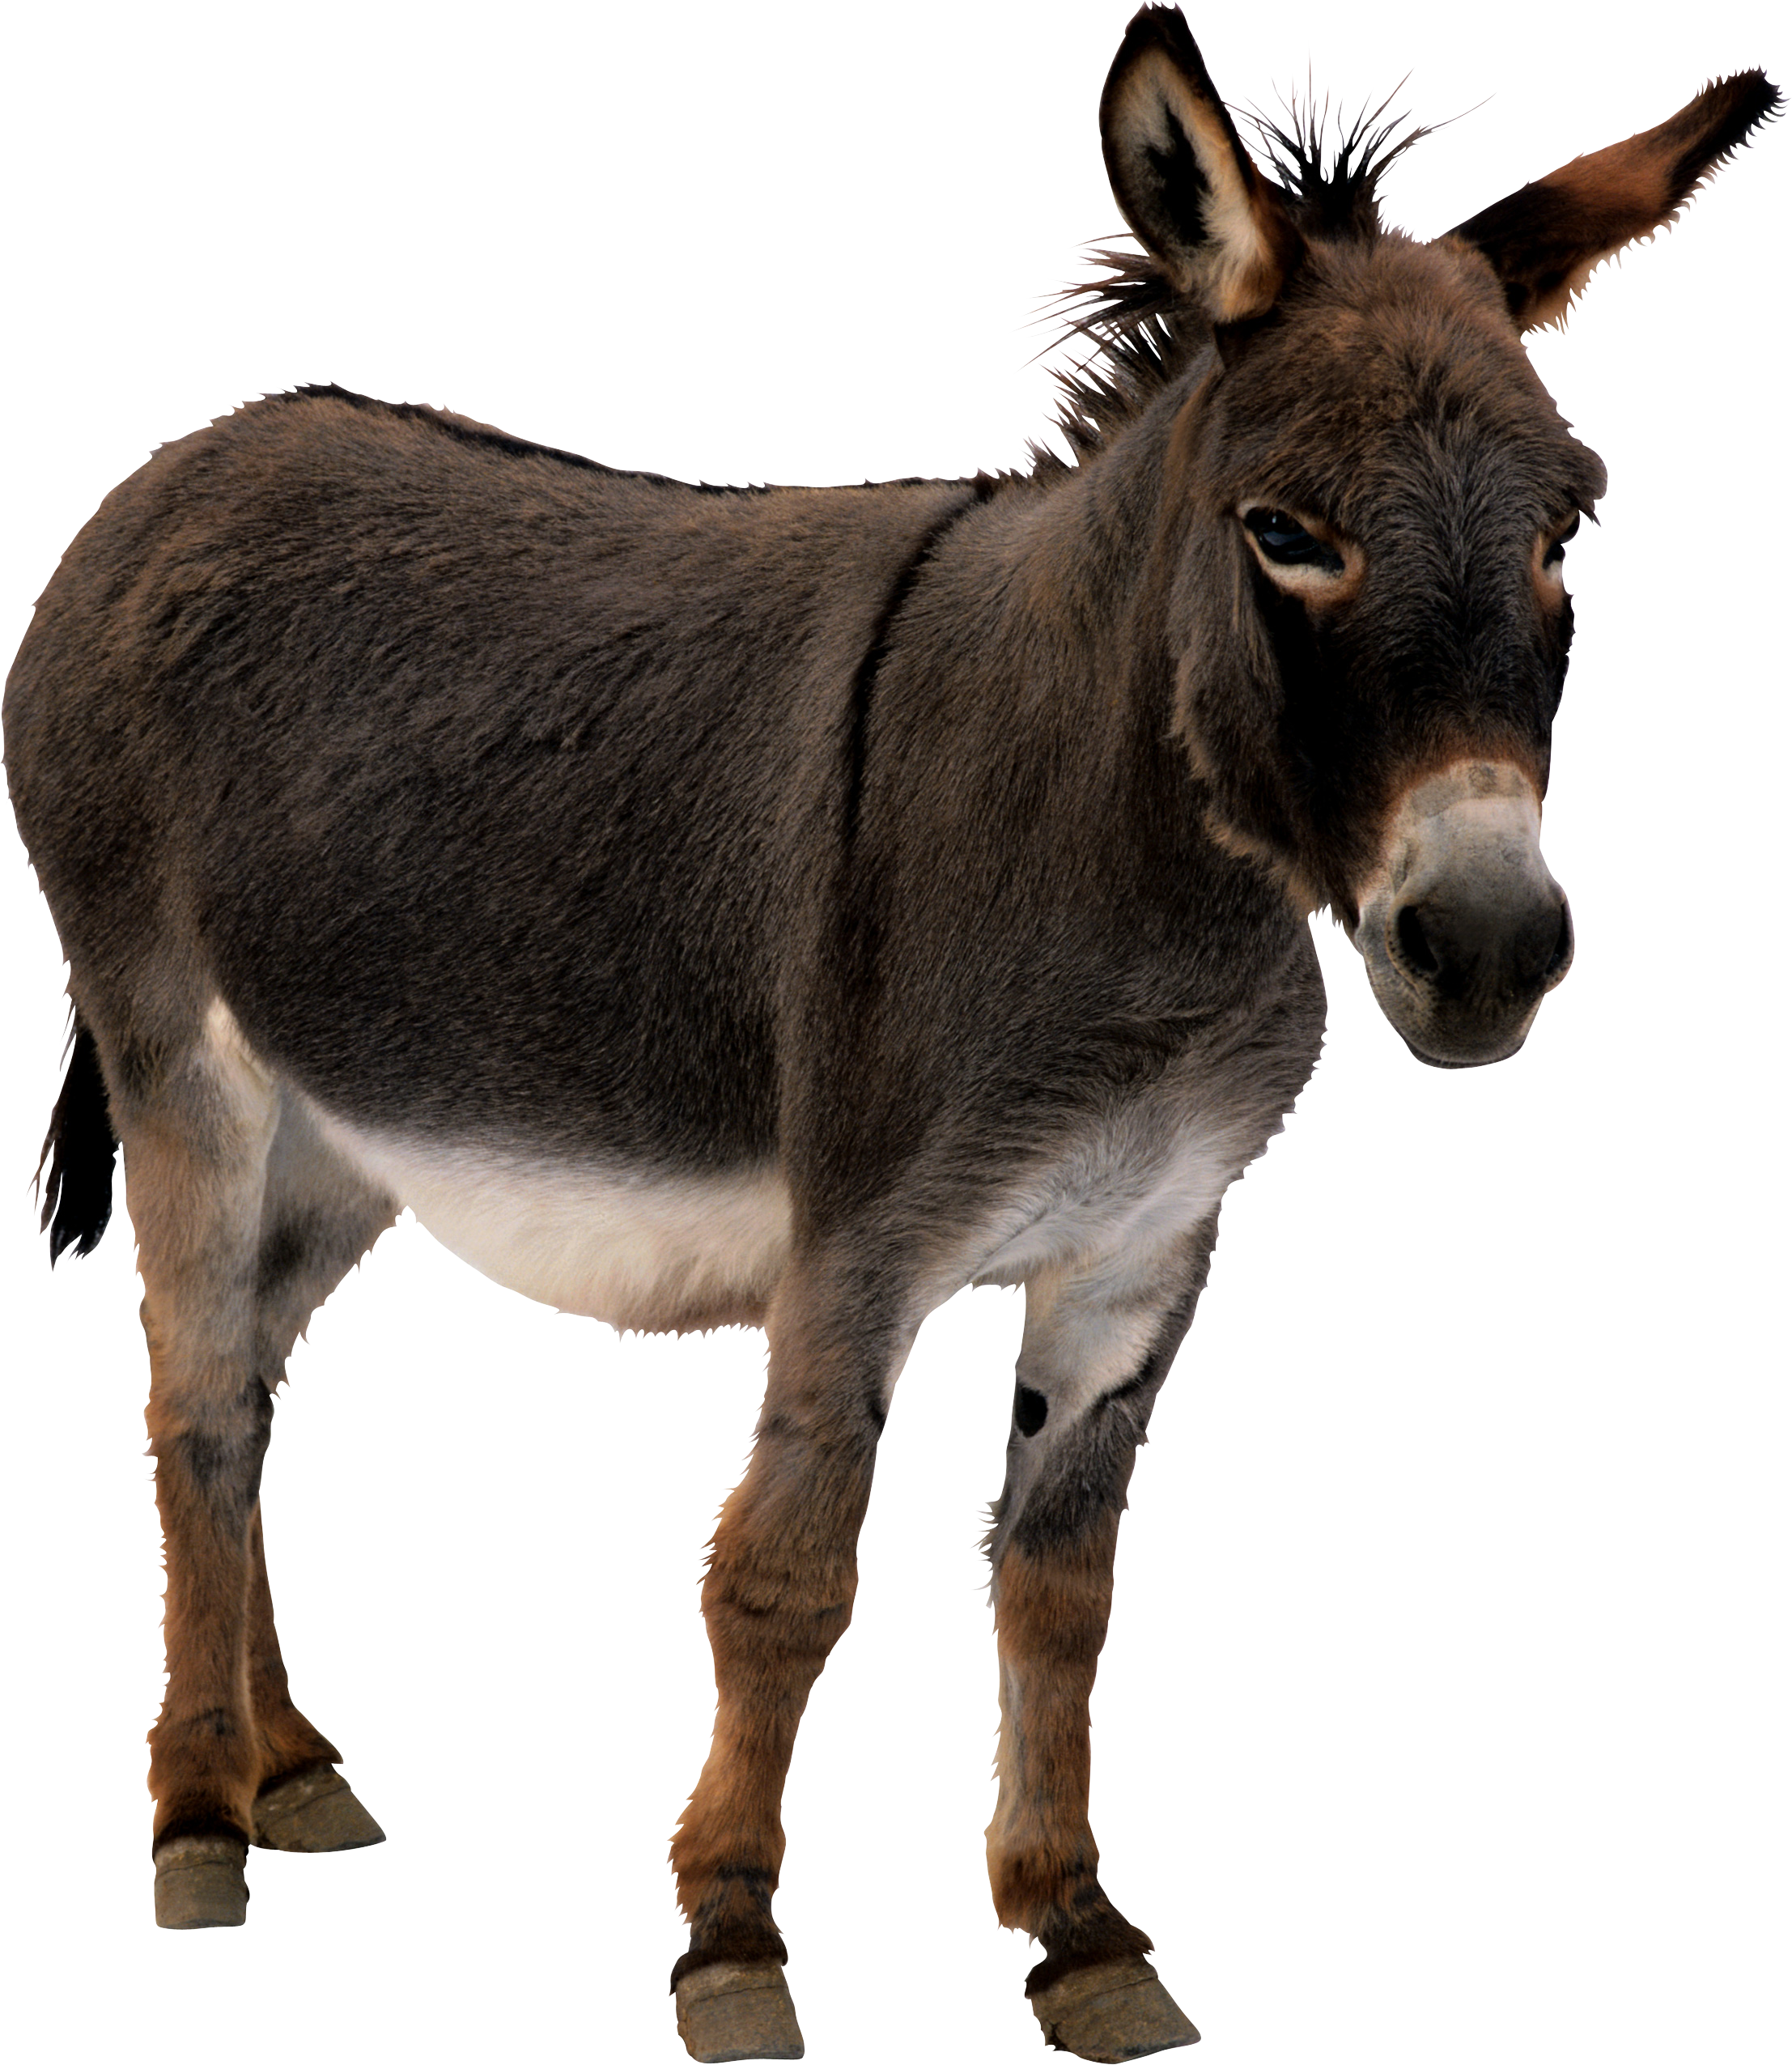 Donkey, black PNG Pic